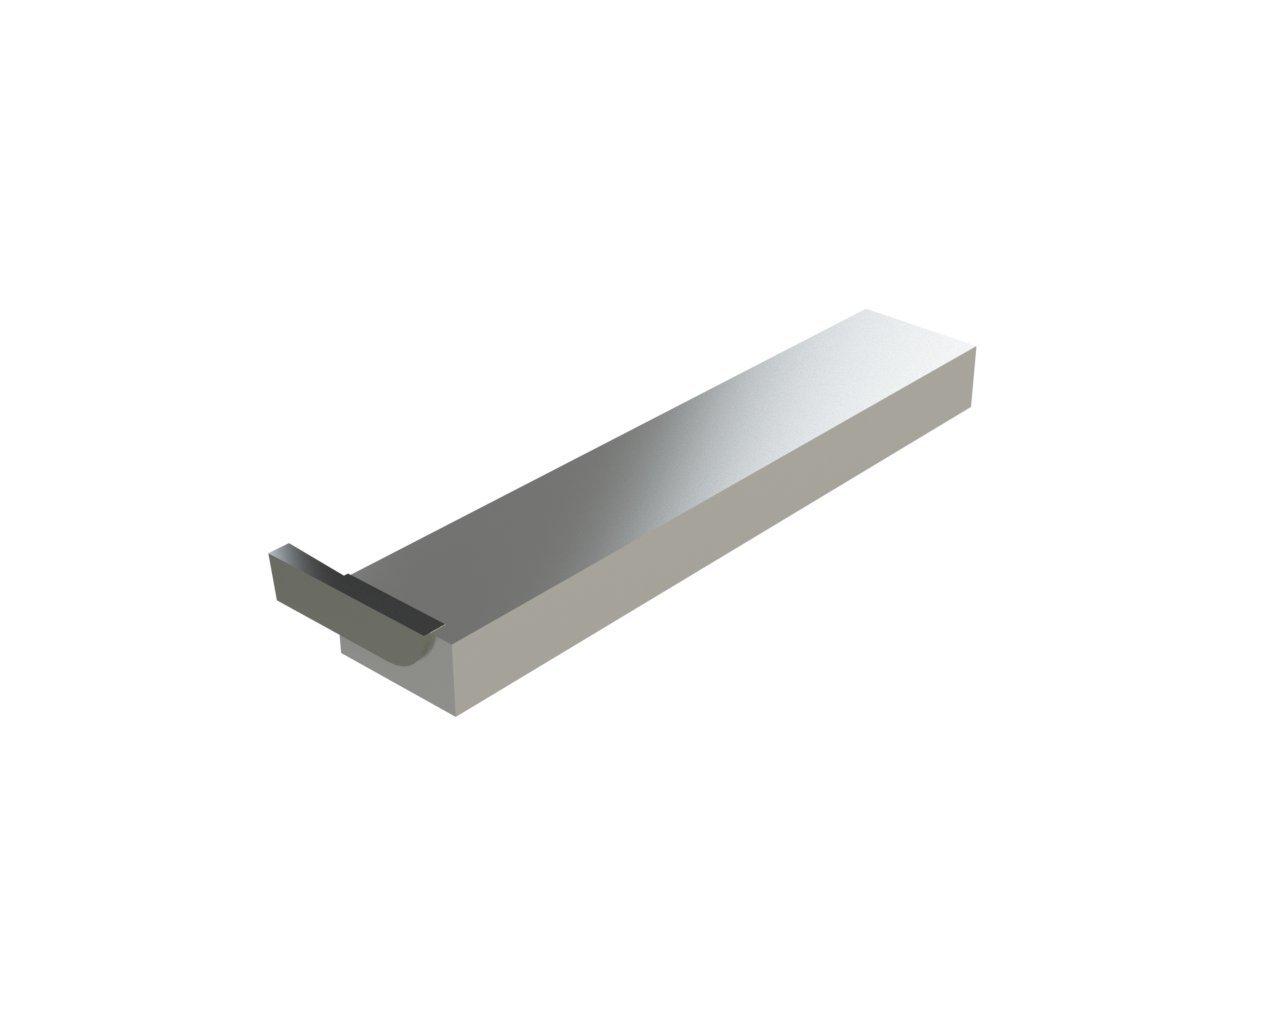 Micro 100 GR-068002 Brazed Groove Tool Square Shank Diameter